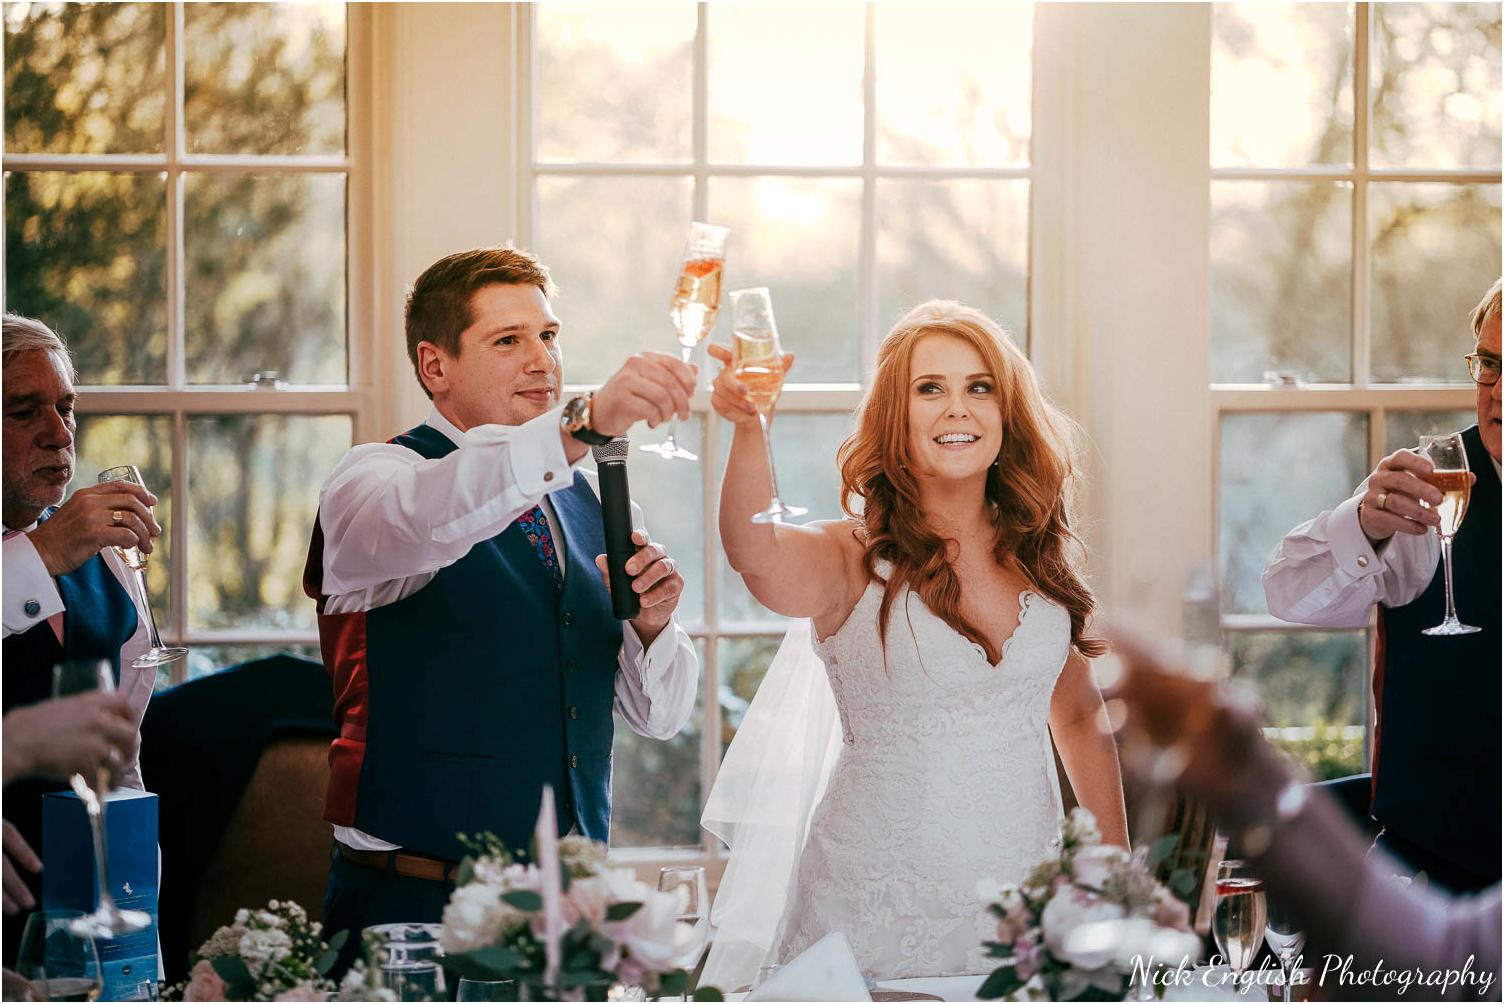 Mitton_Hall_Wedding_Photographer-176.jpg